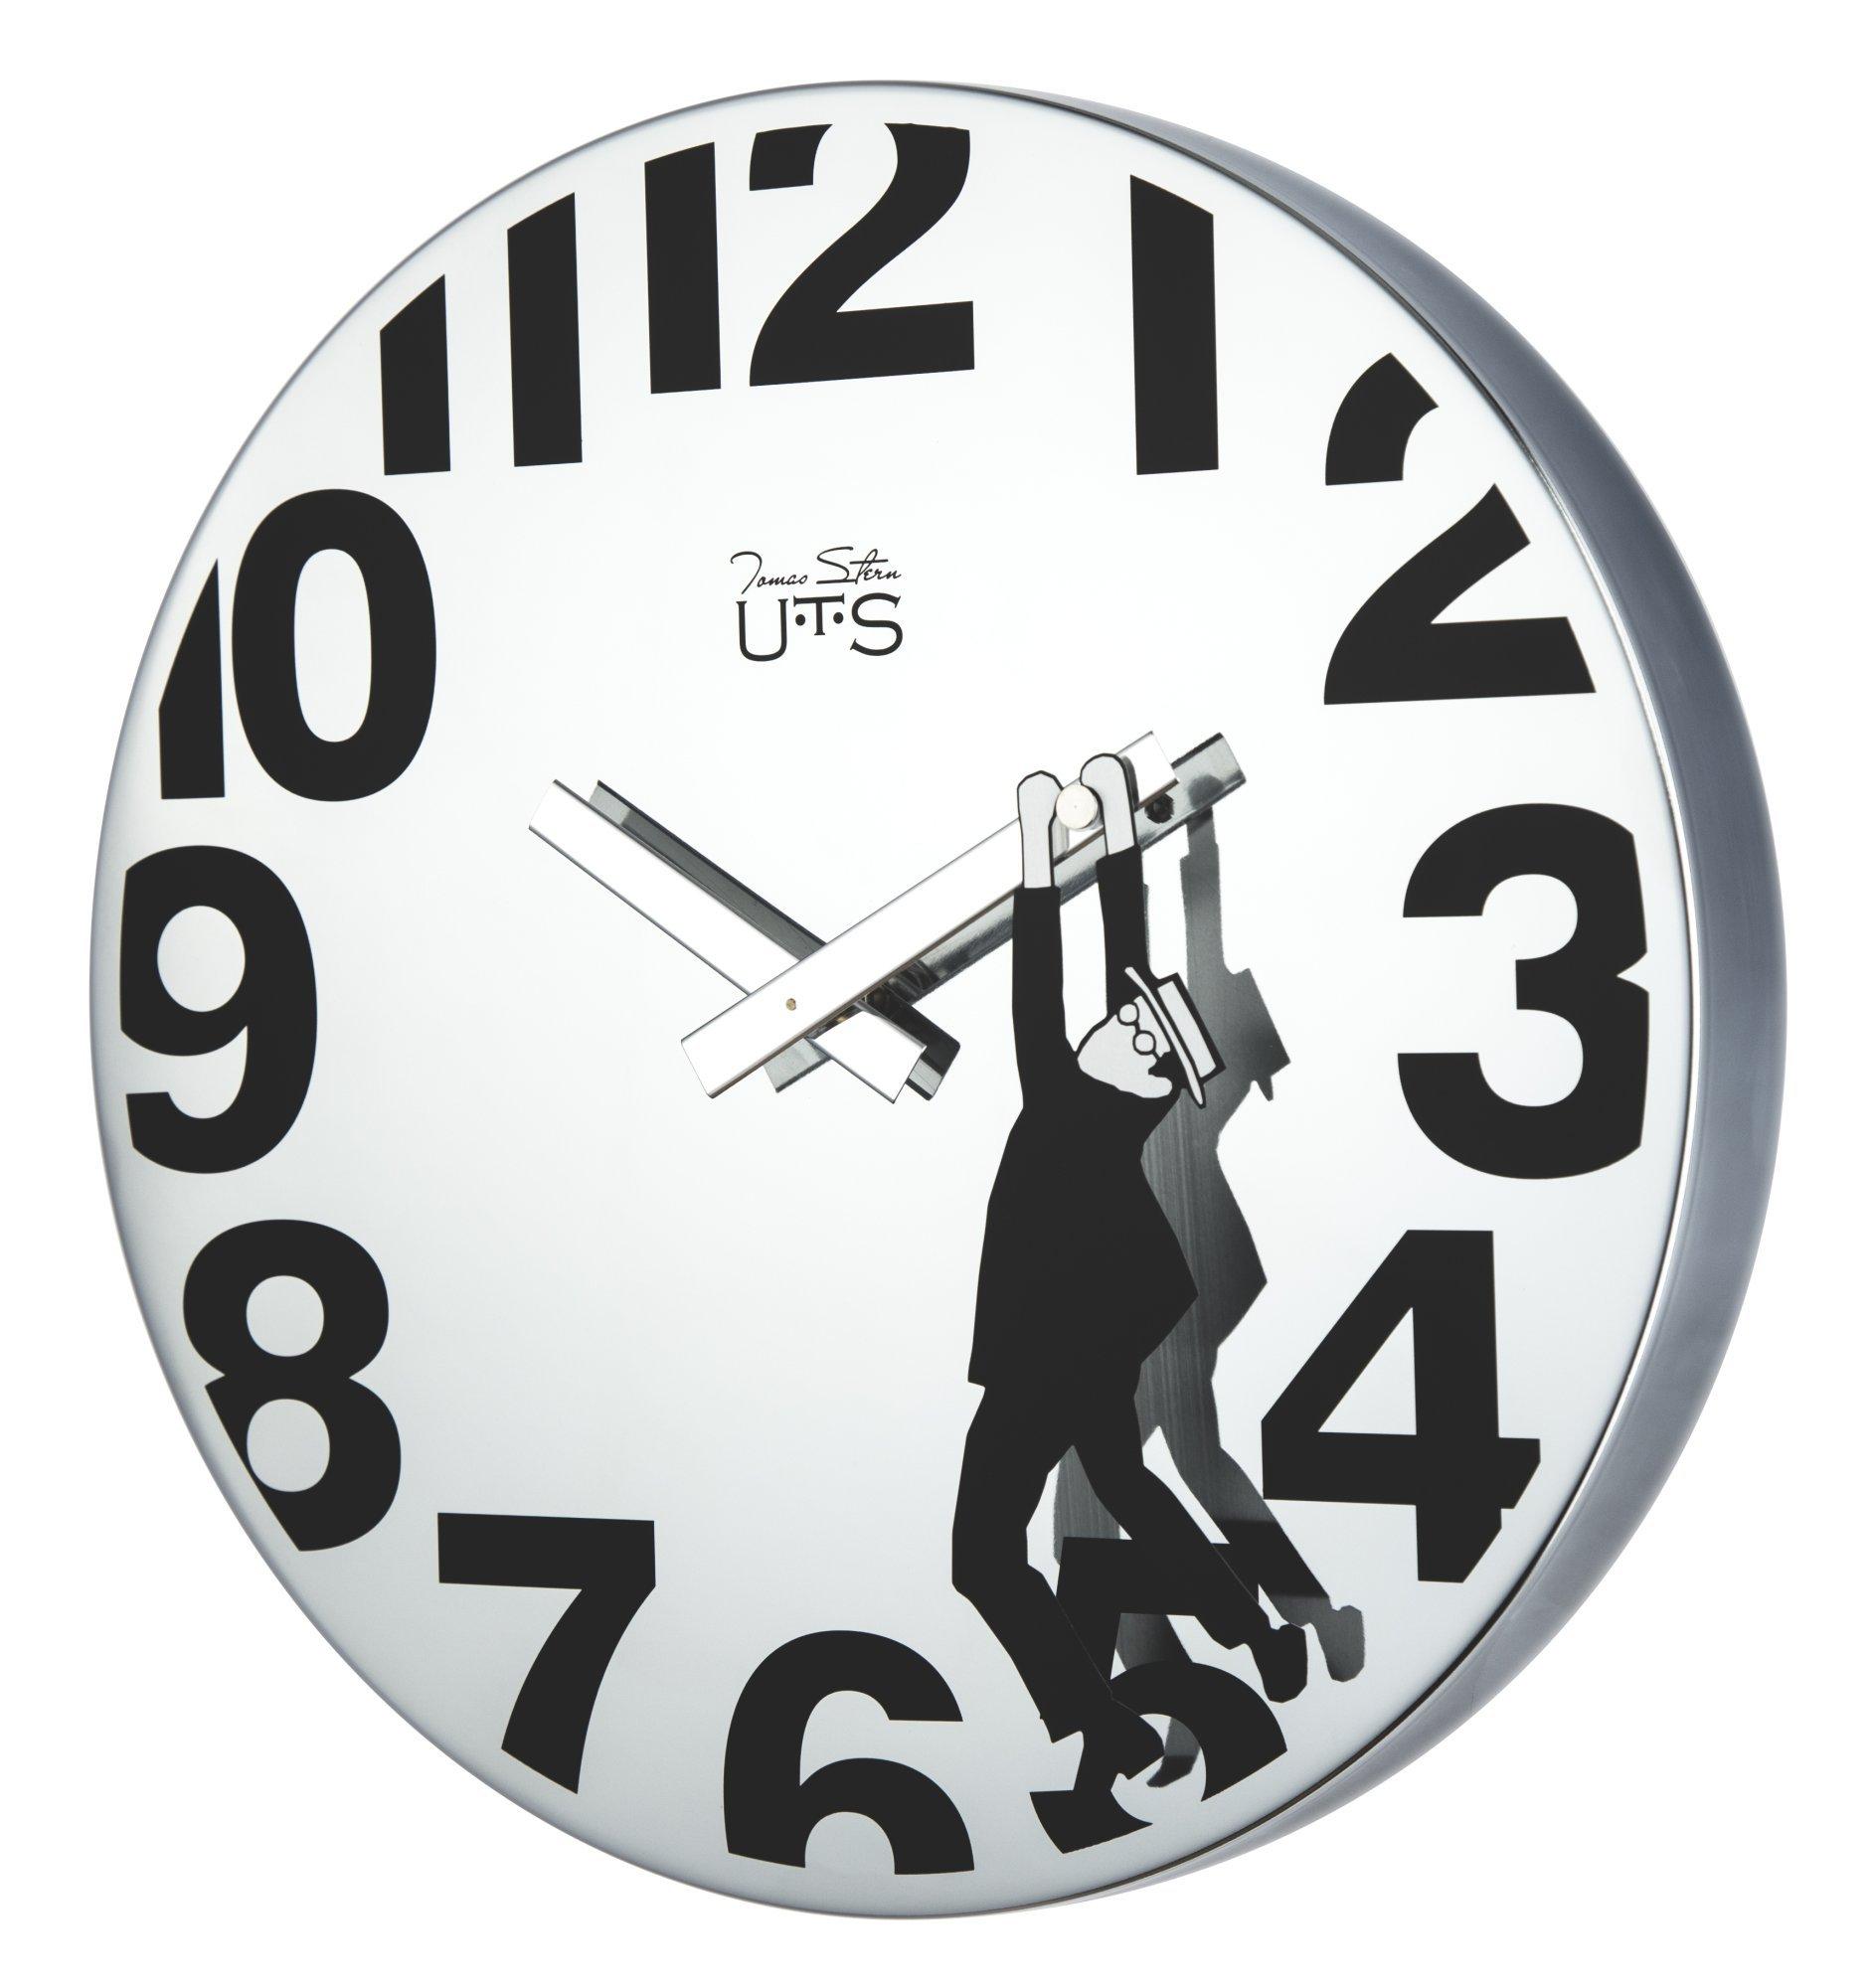 Часы настенные Часы настенные Tomas Stern 4012S chasy-nastennye-tomas-stern-4012s-germaniya.jpg